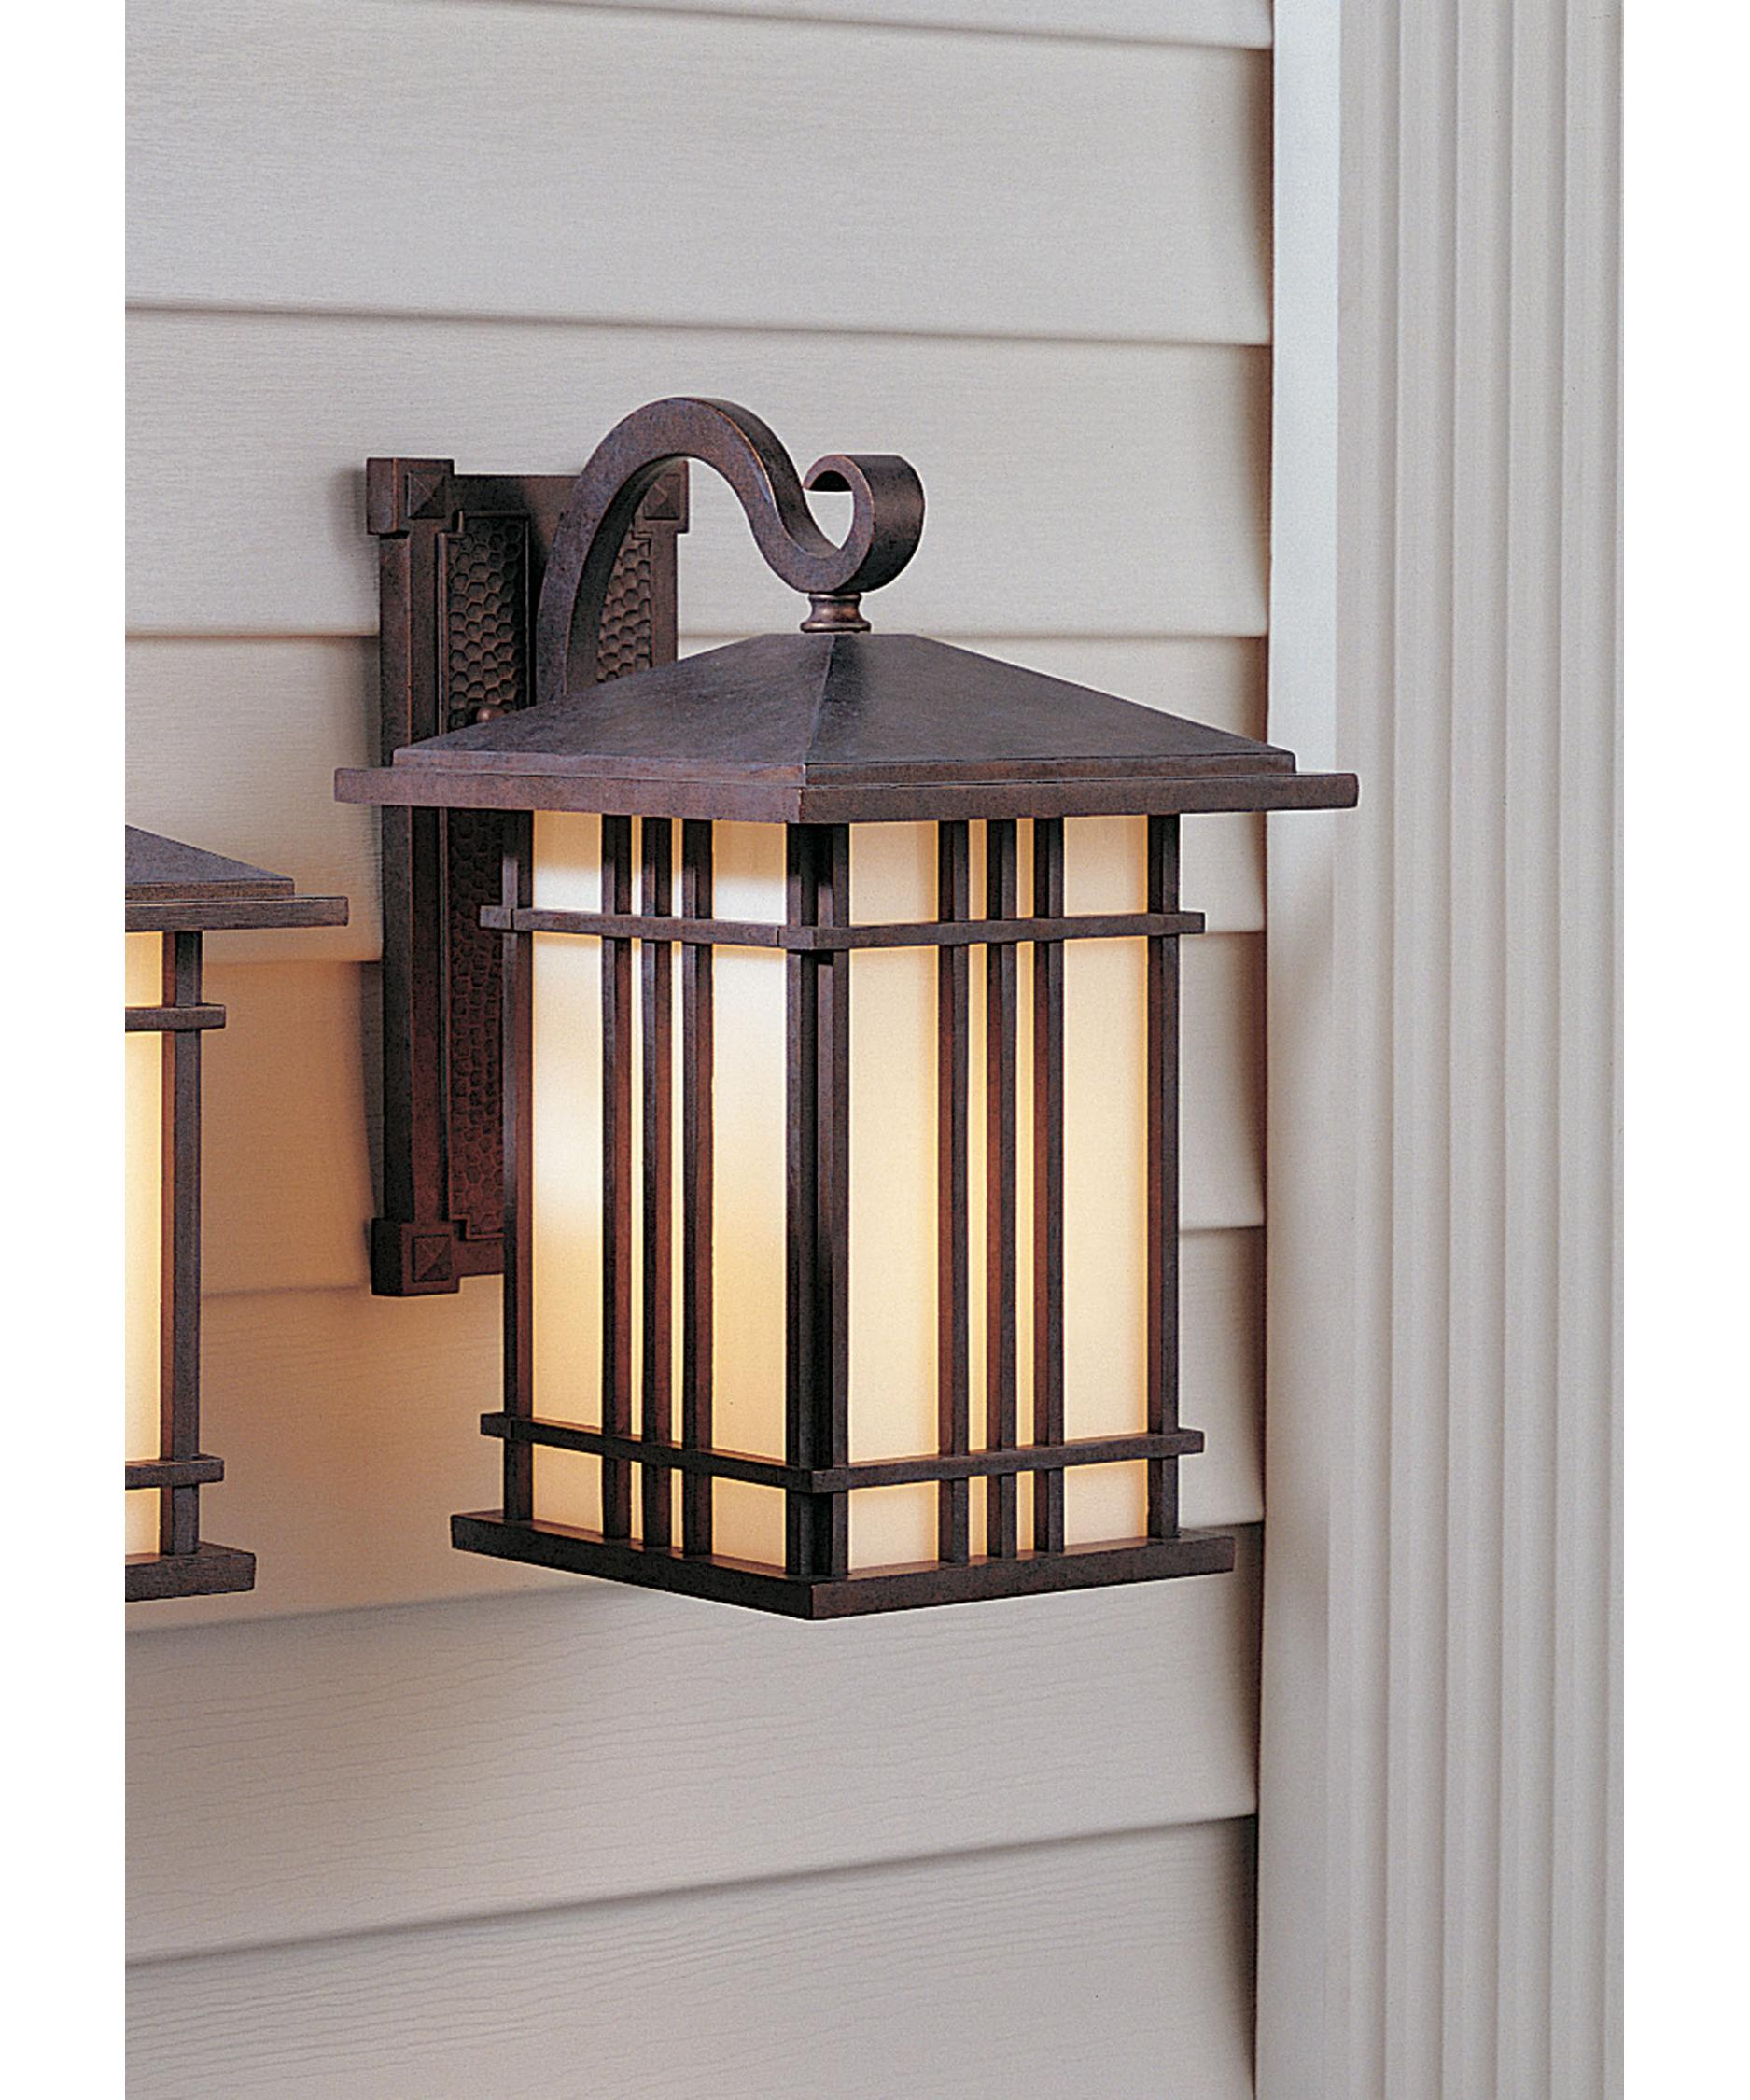 Murray Feiss Outdoor Lighting: Murray Feiss OL1801 Prairie House 1 Light Outdoor Wall